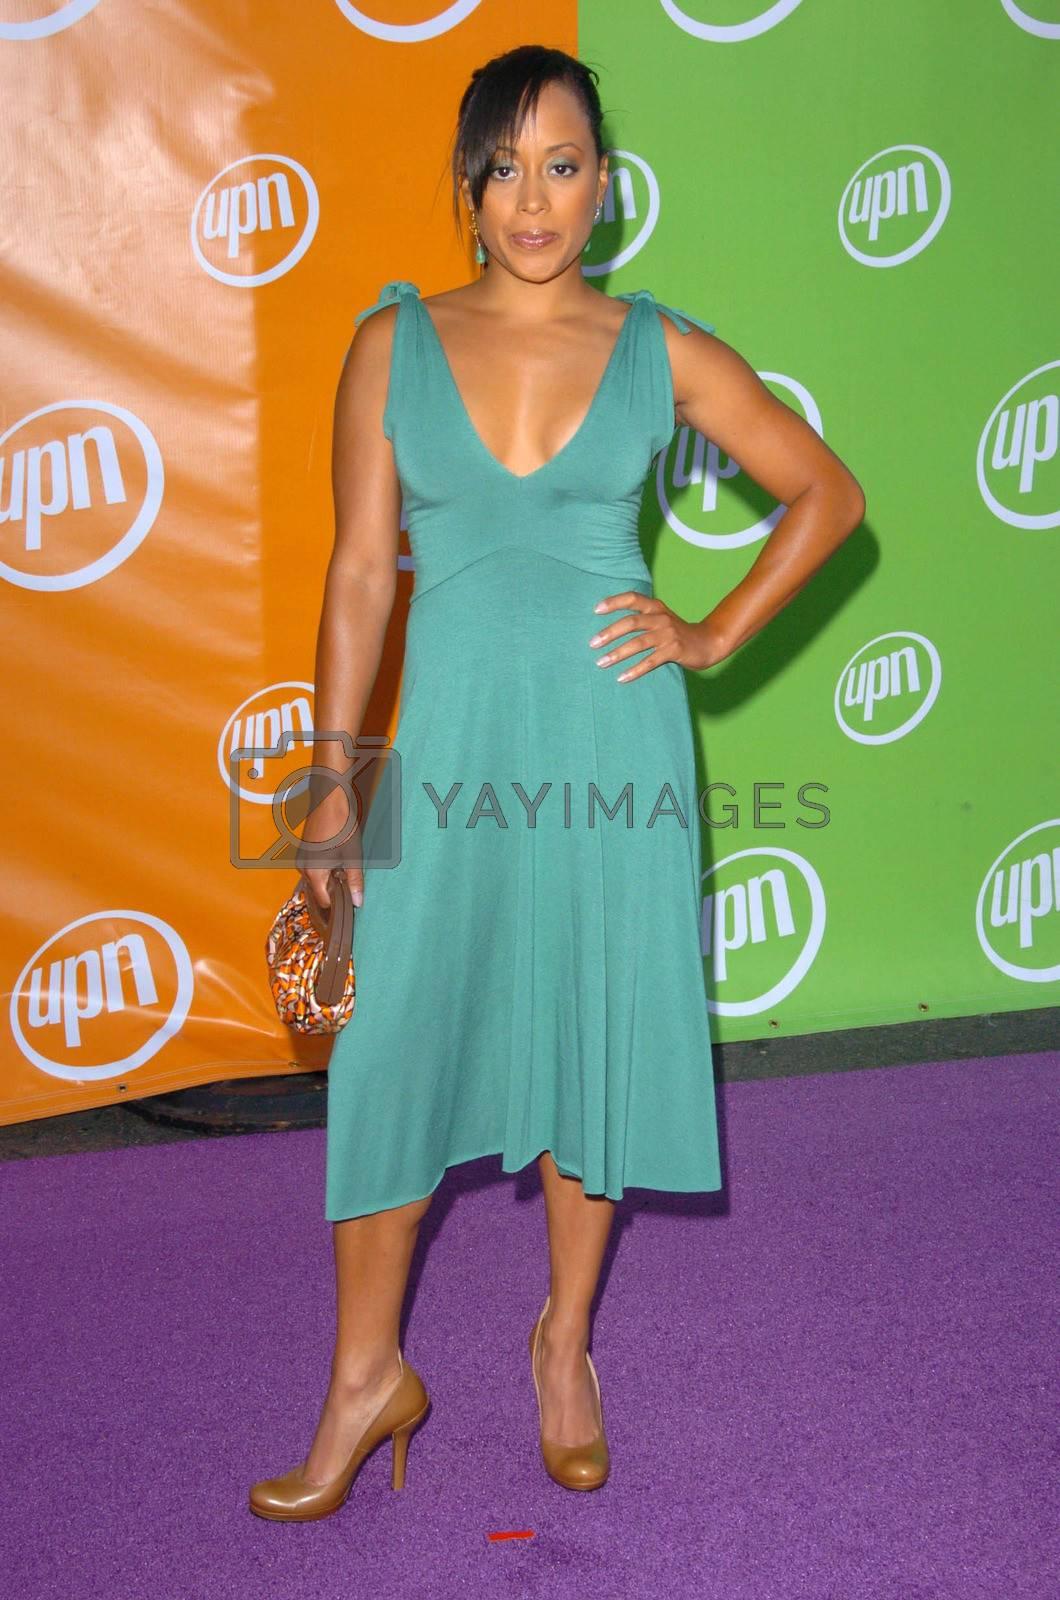 Essence Atkins At the UPN Summer TCA Party, Paramount Studios, Hollywood, CA 07-21-05